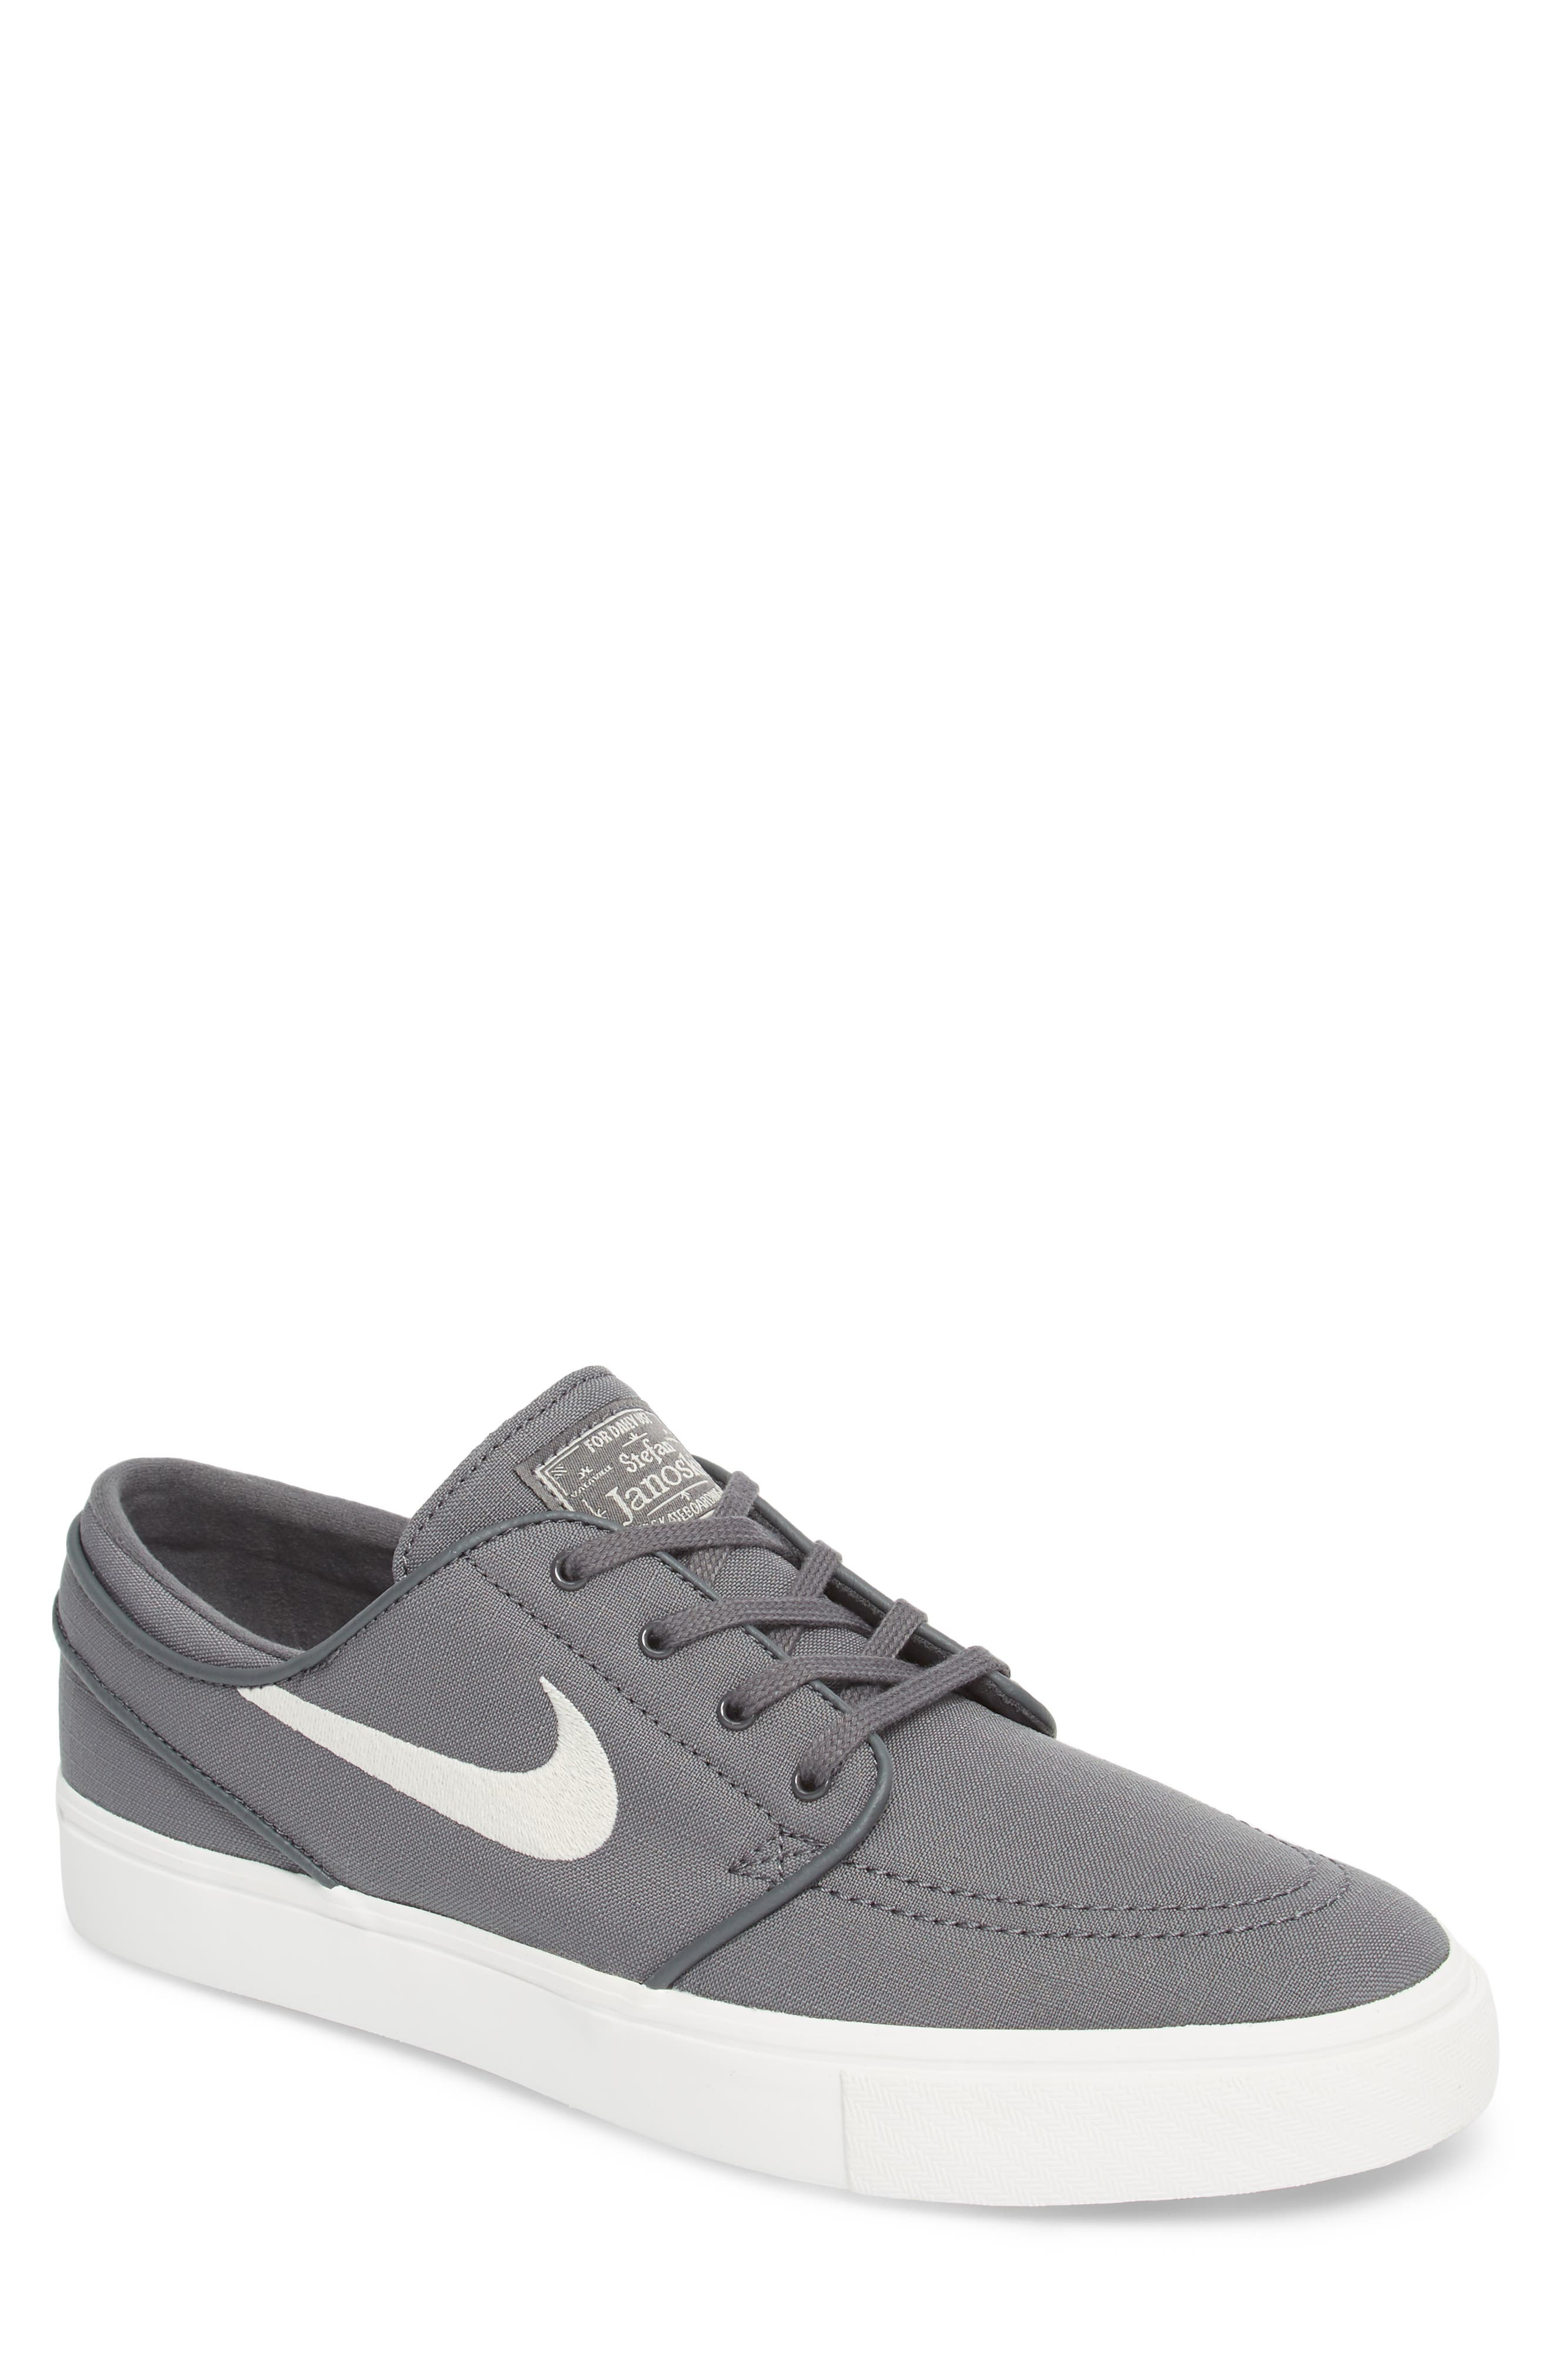 'Zoom - Stefan Janoski SB' Canvas Skate Shoe,                         Main,                         color, Dark Grey/ Bone/ White/ Black